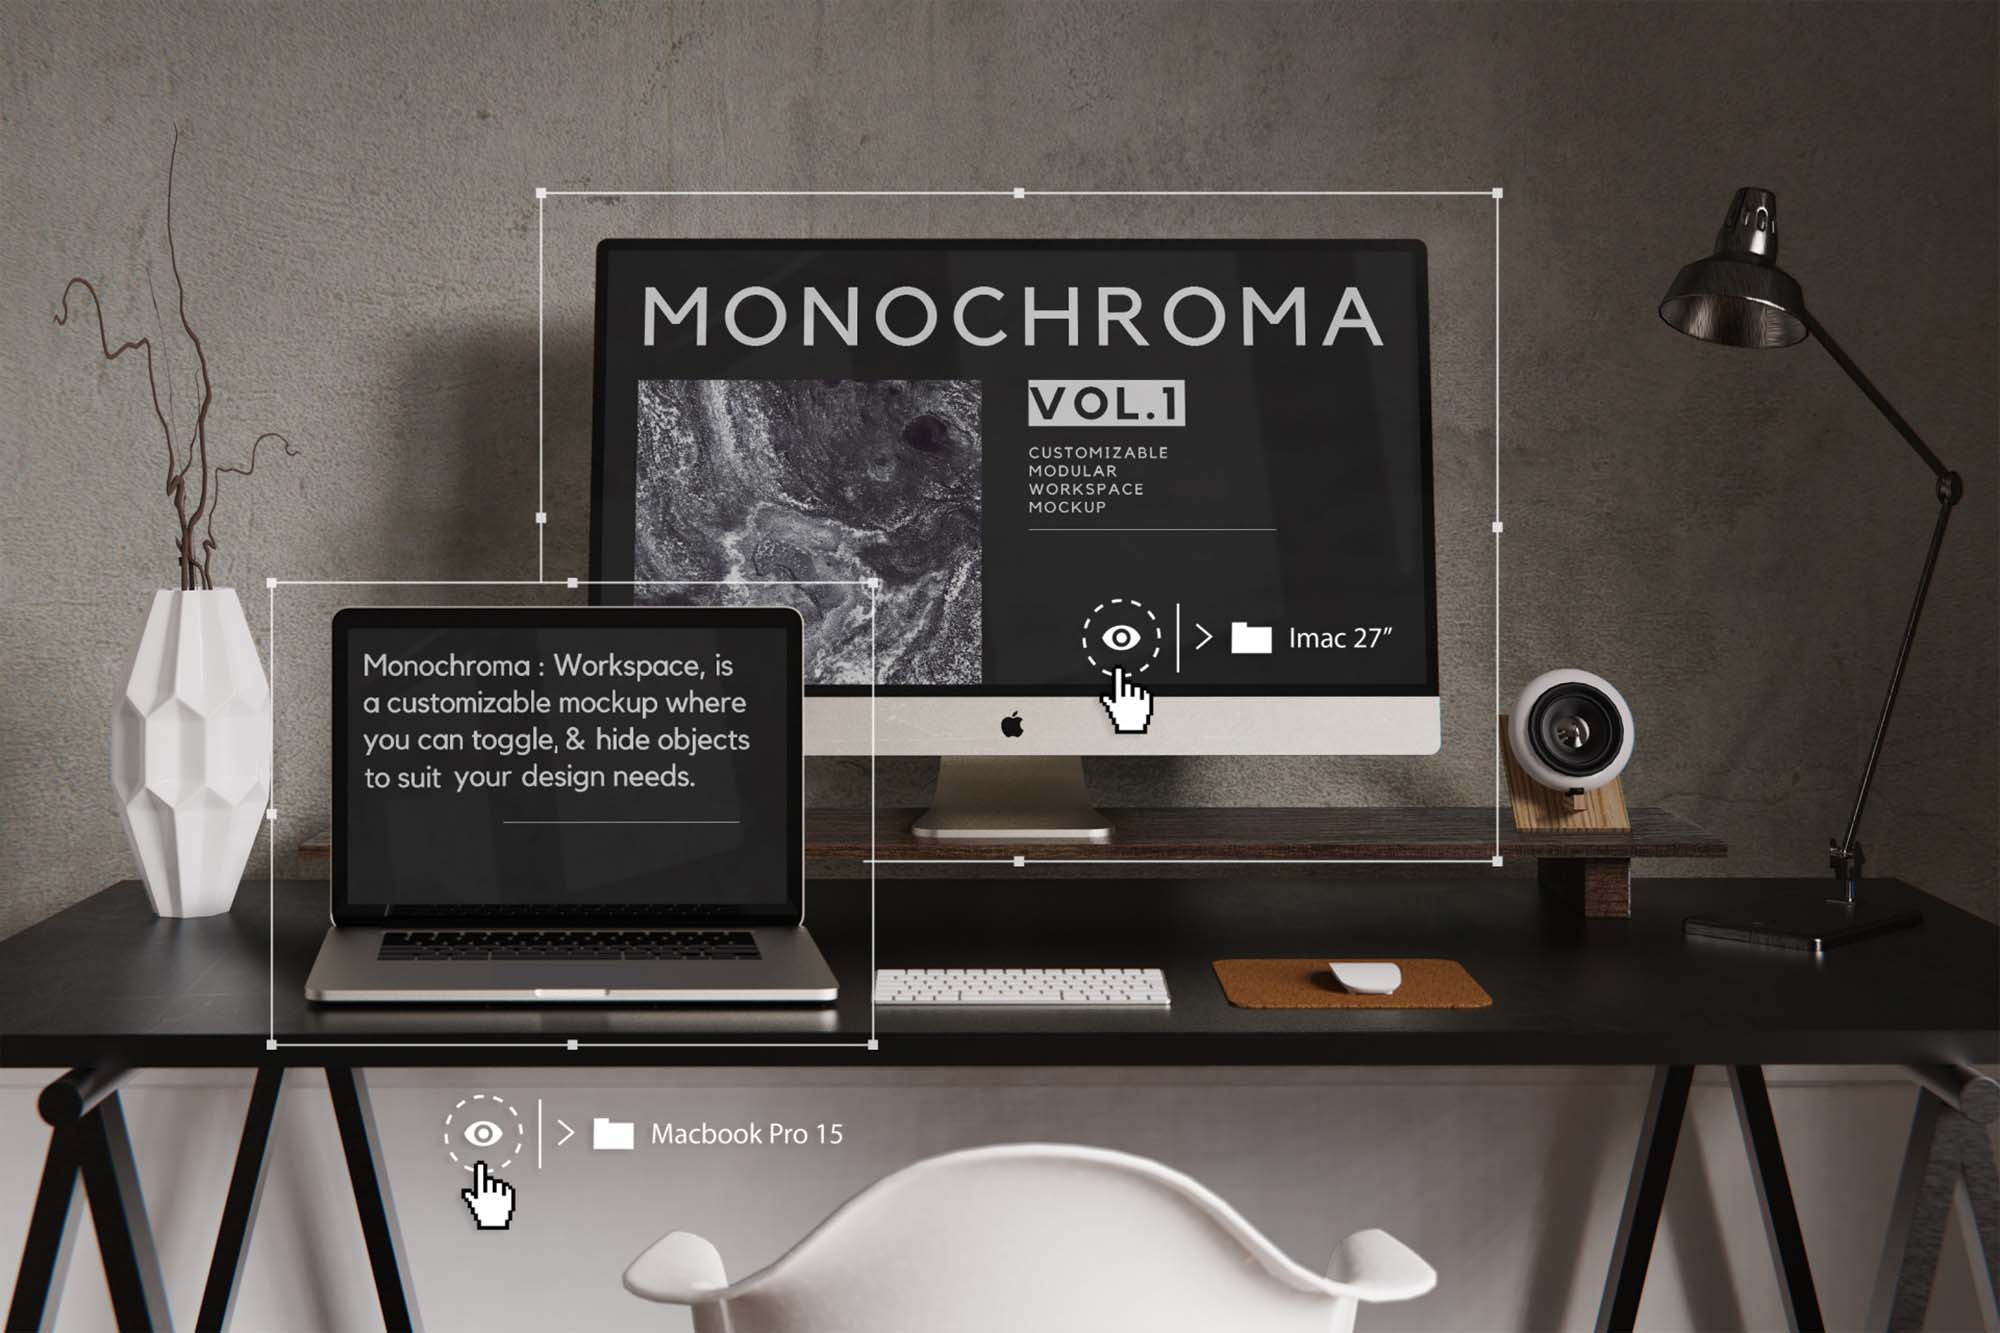 Customizable Workspace Mockup 1